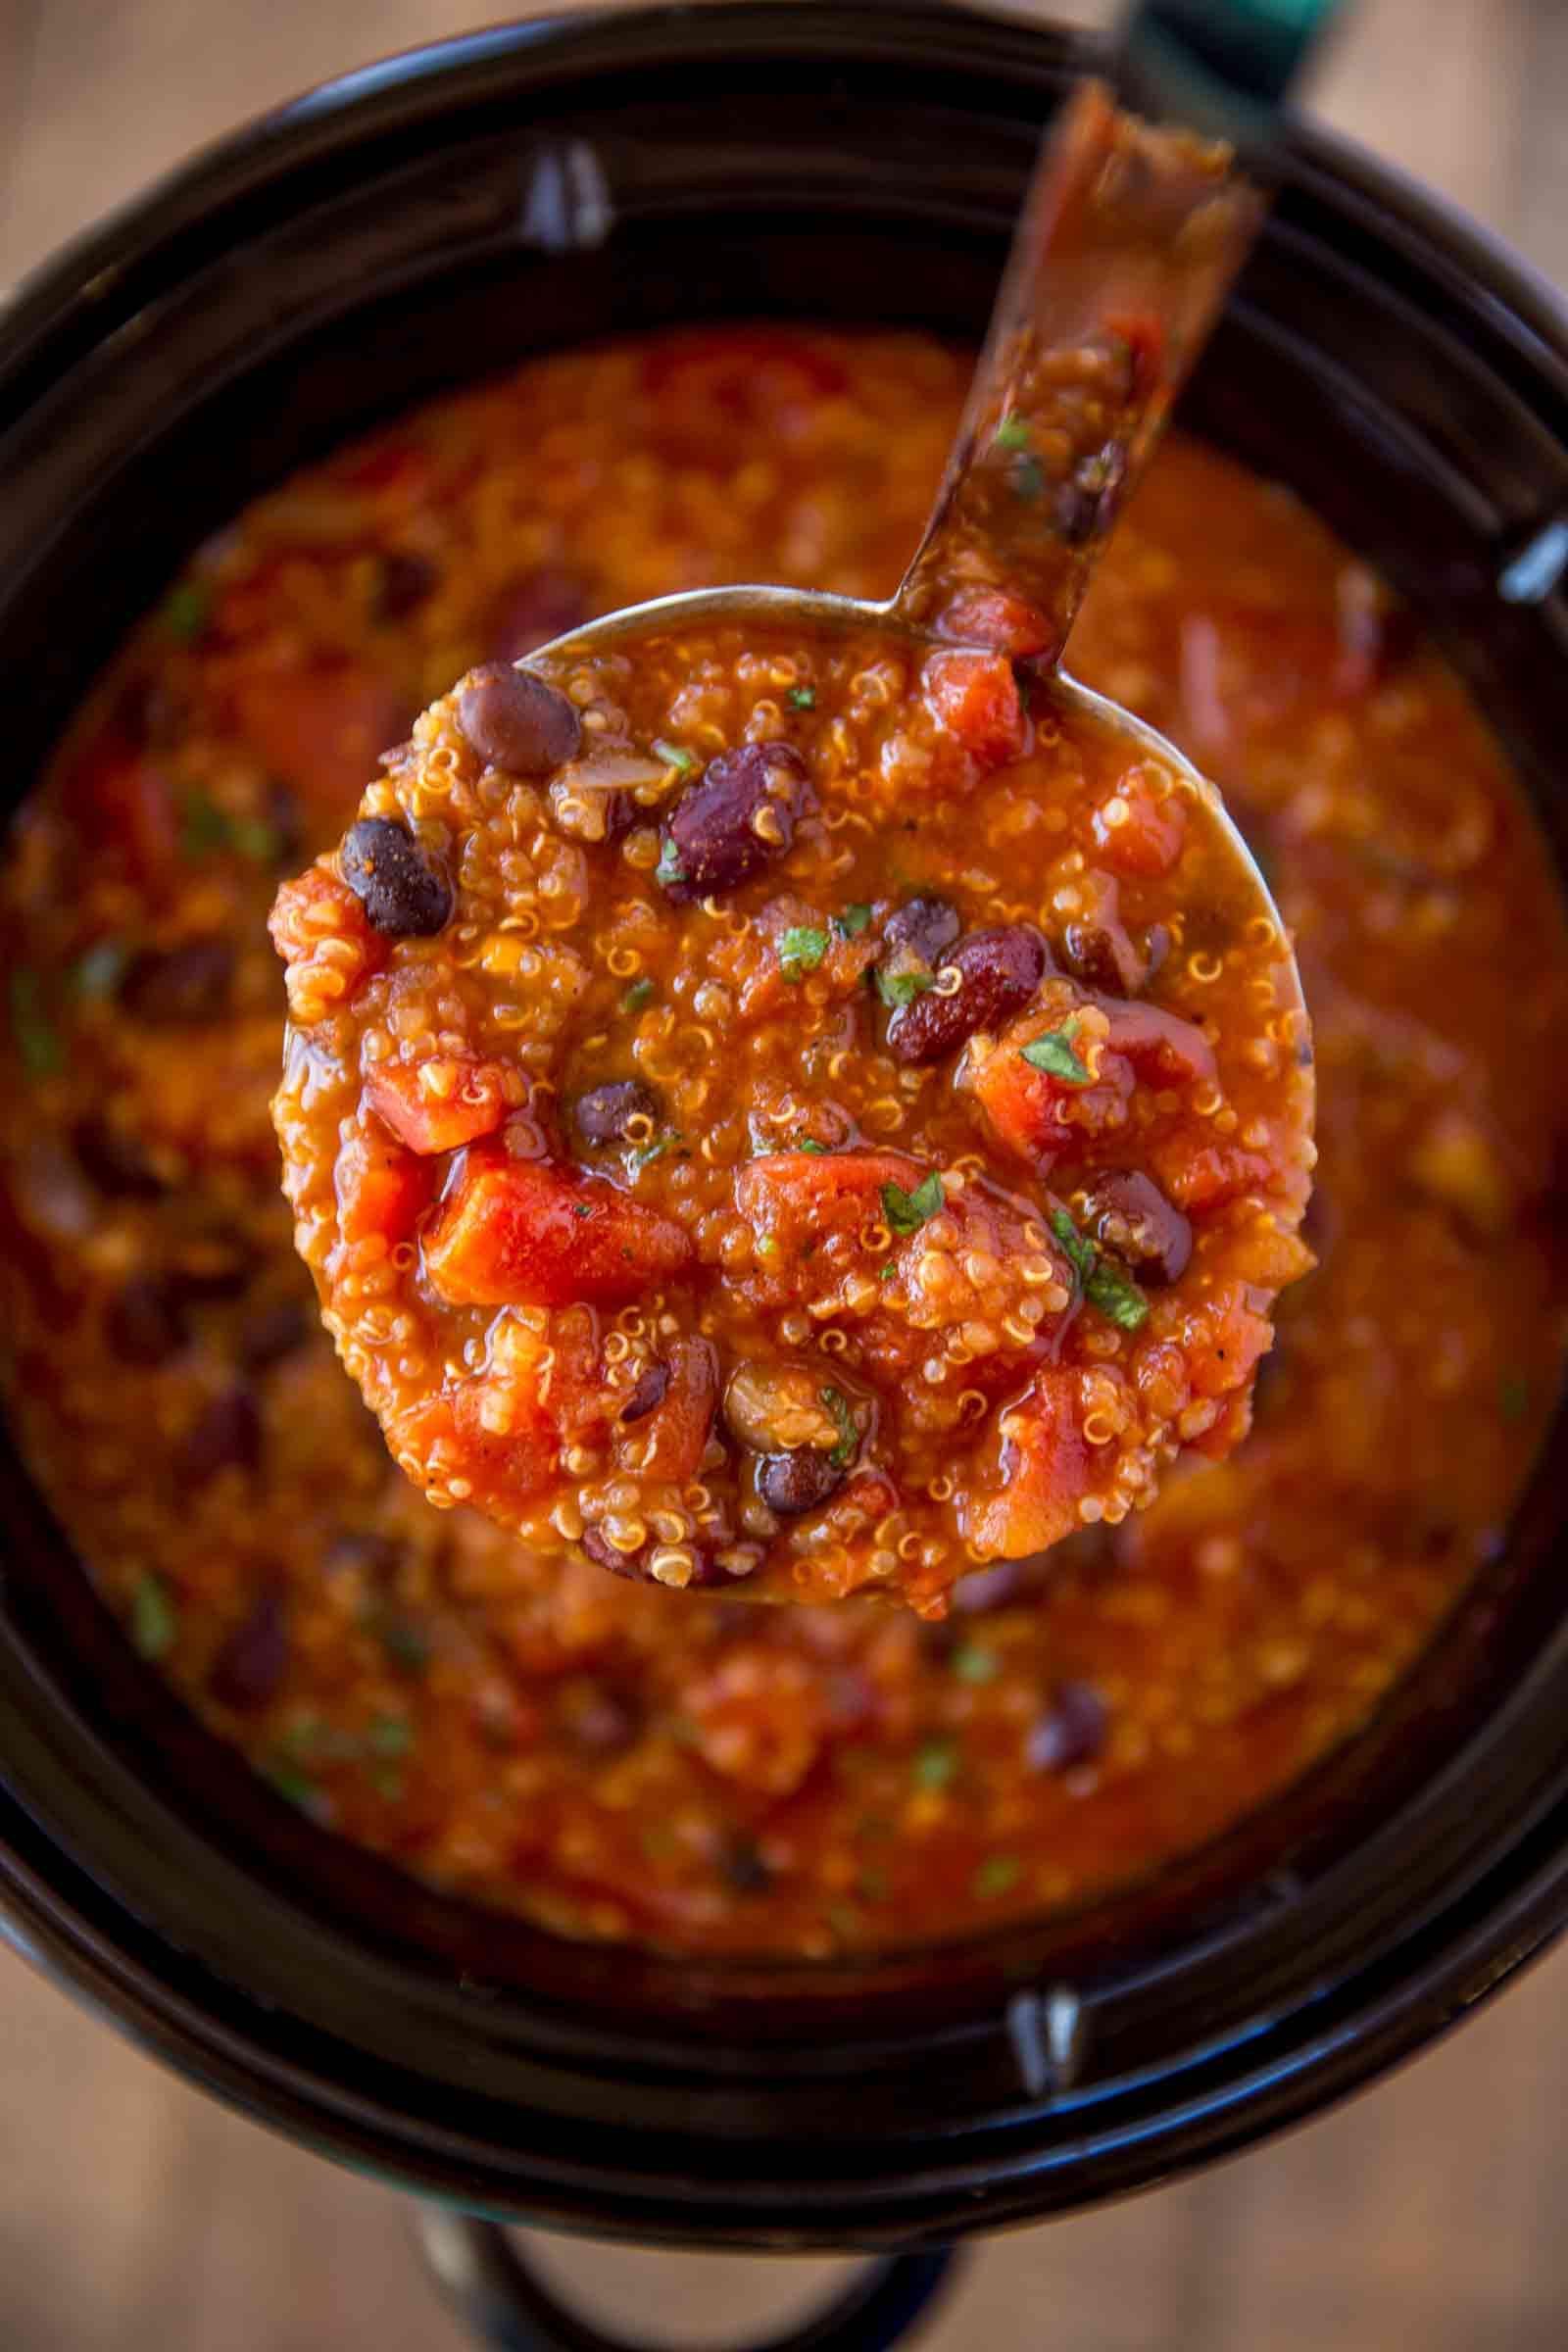 Quinoa Slow Cooker  Slow Cooker Ve arian Quinoa Chili Cafe Delites